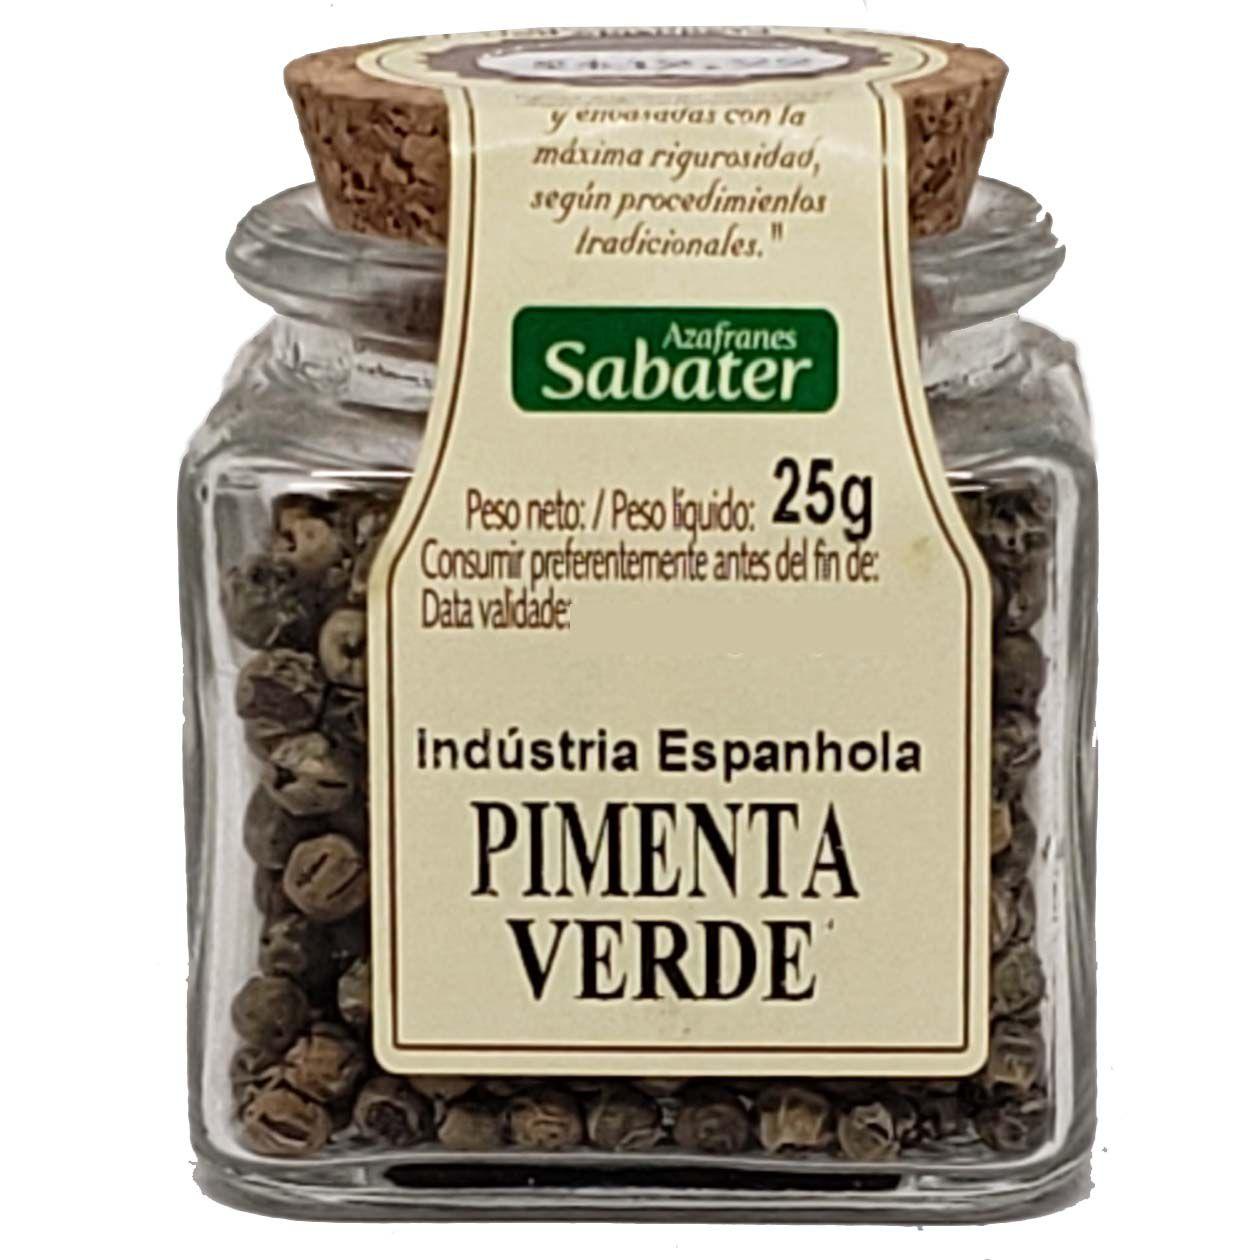 Pimenta Verde Azafranes Sabater - 25g -